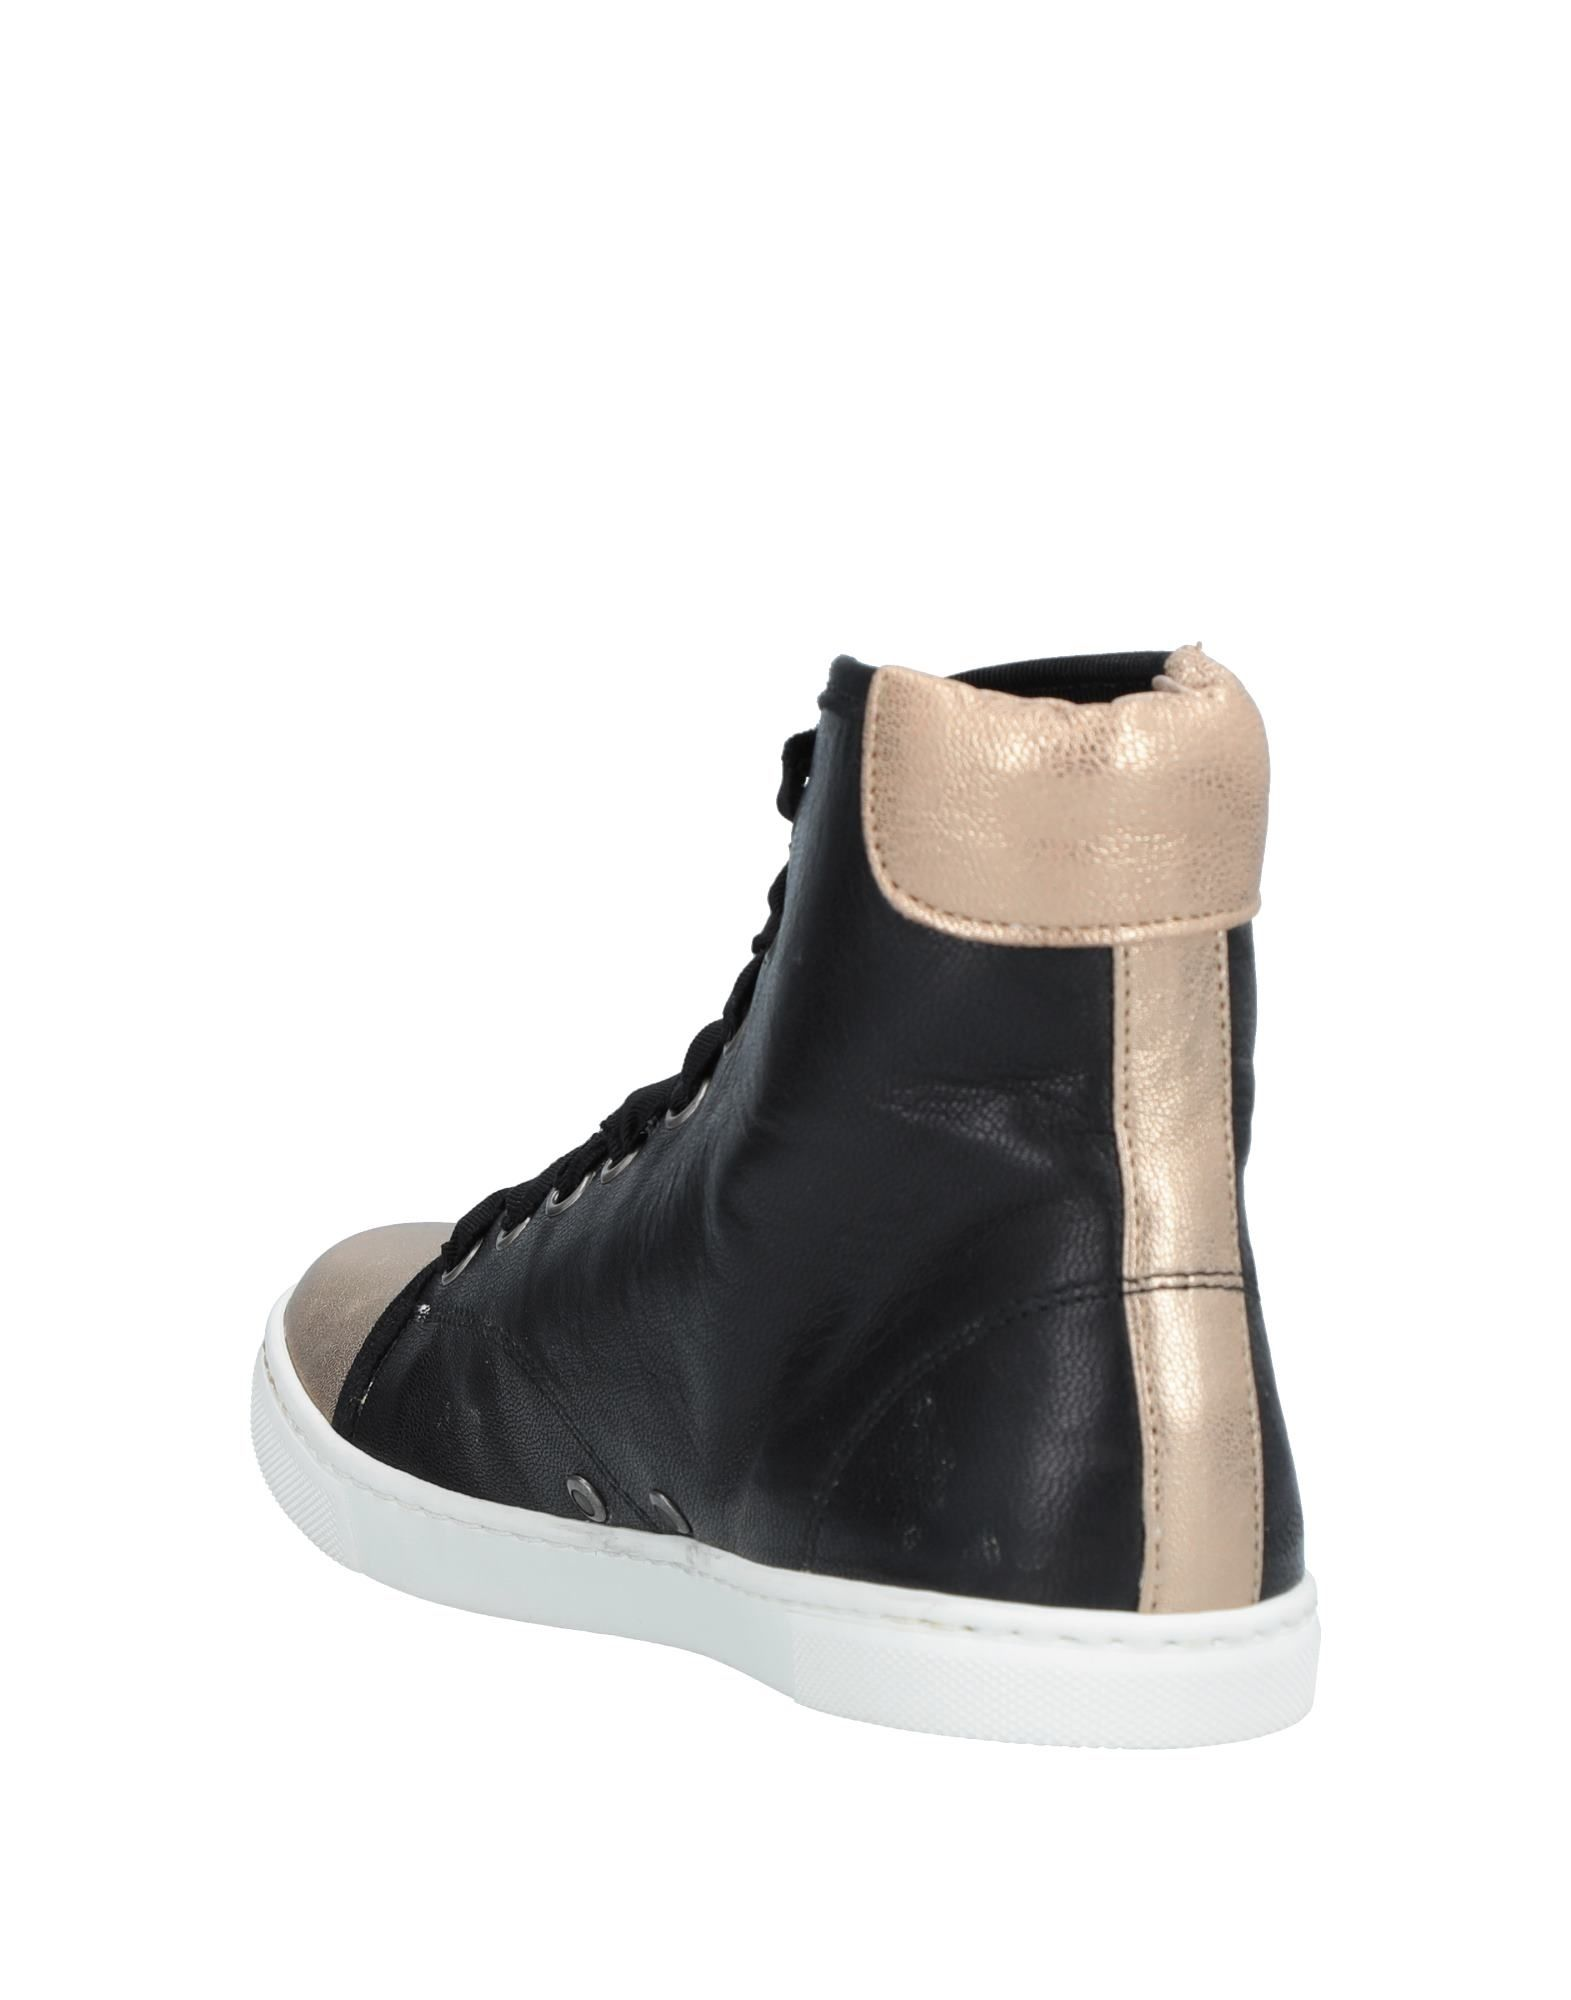 Rabatt Schuhe 11379230TI Lanvin Sneakers Damen  11379230TI Schuhe fee1b3